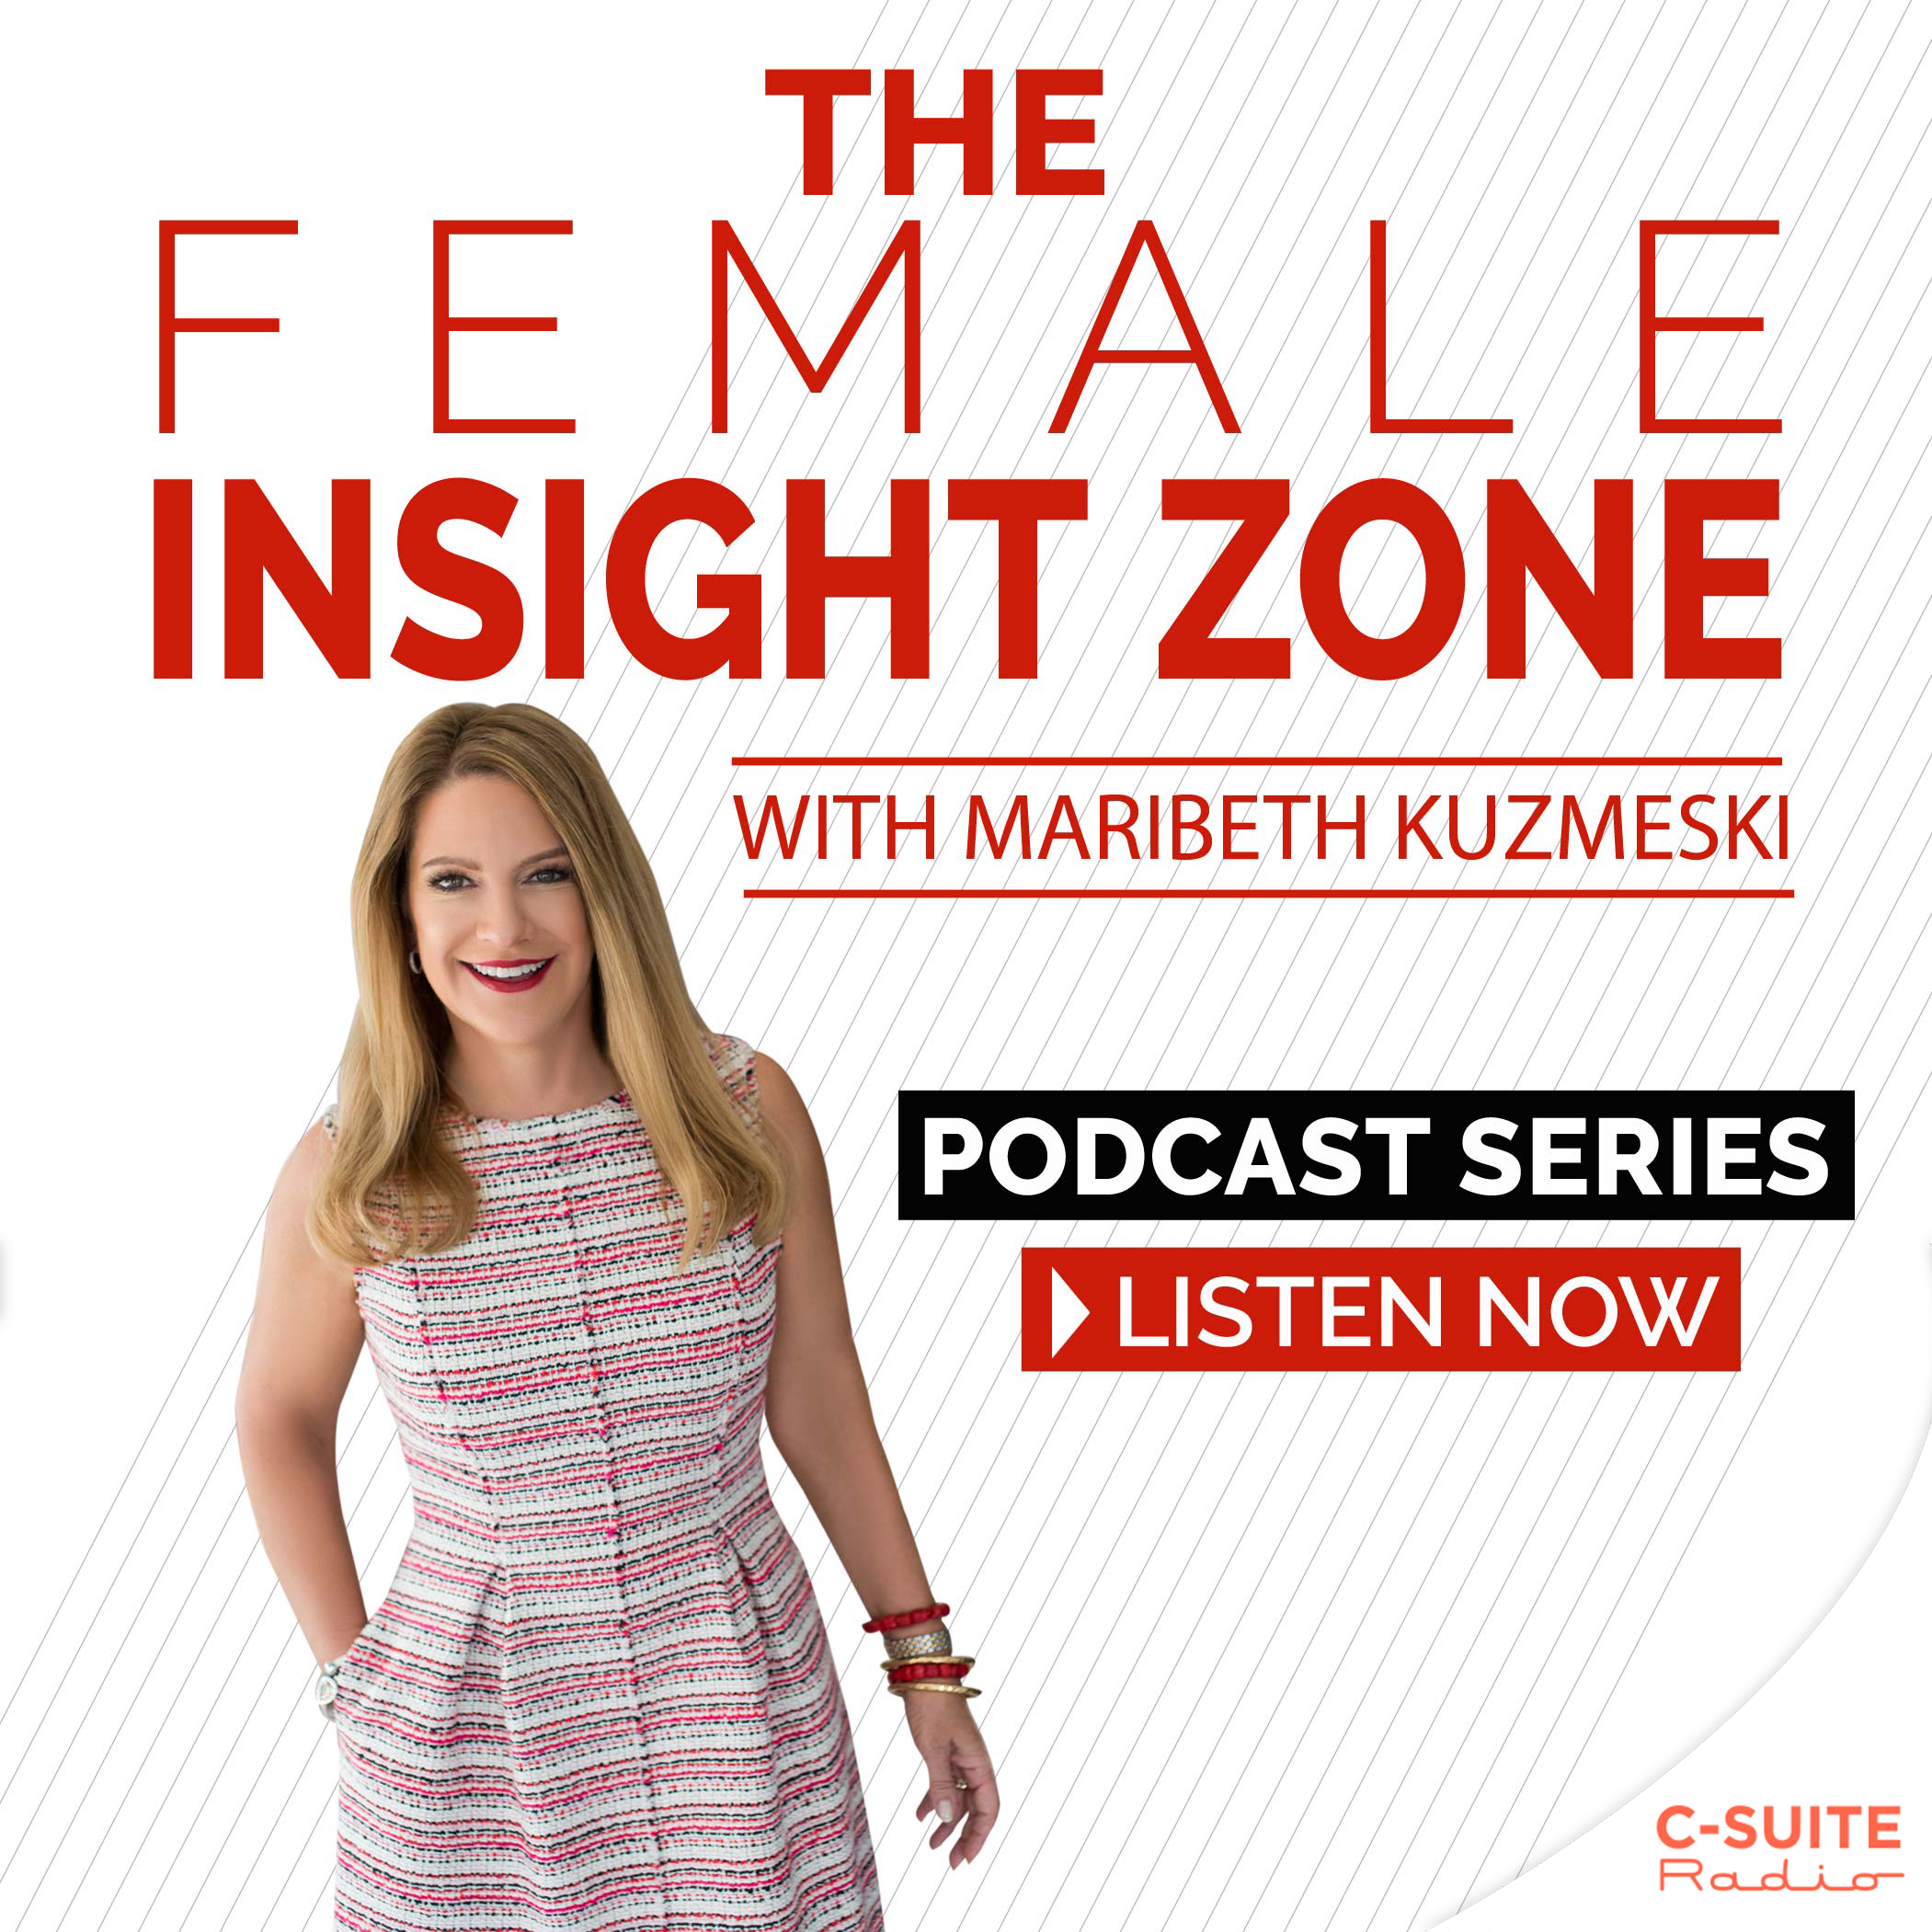 The Female Insight Zone